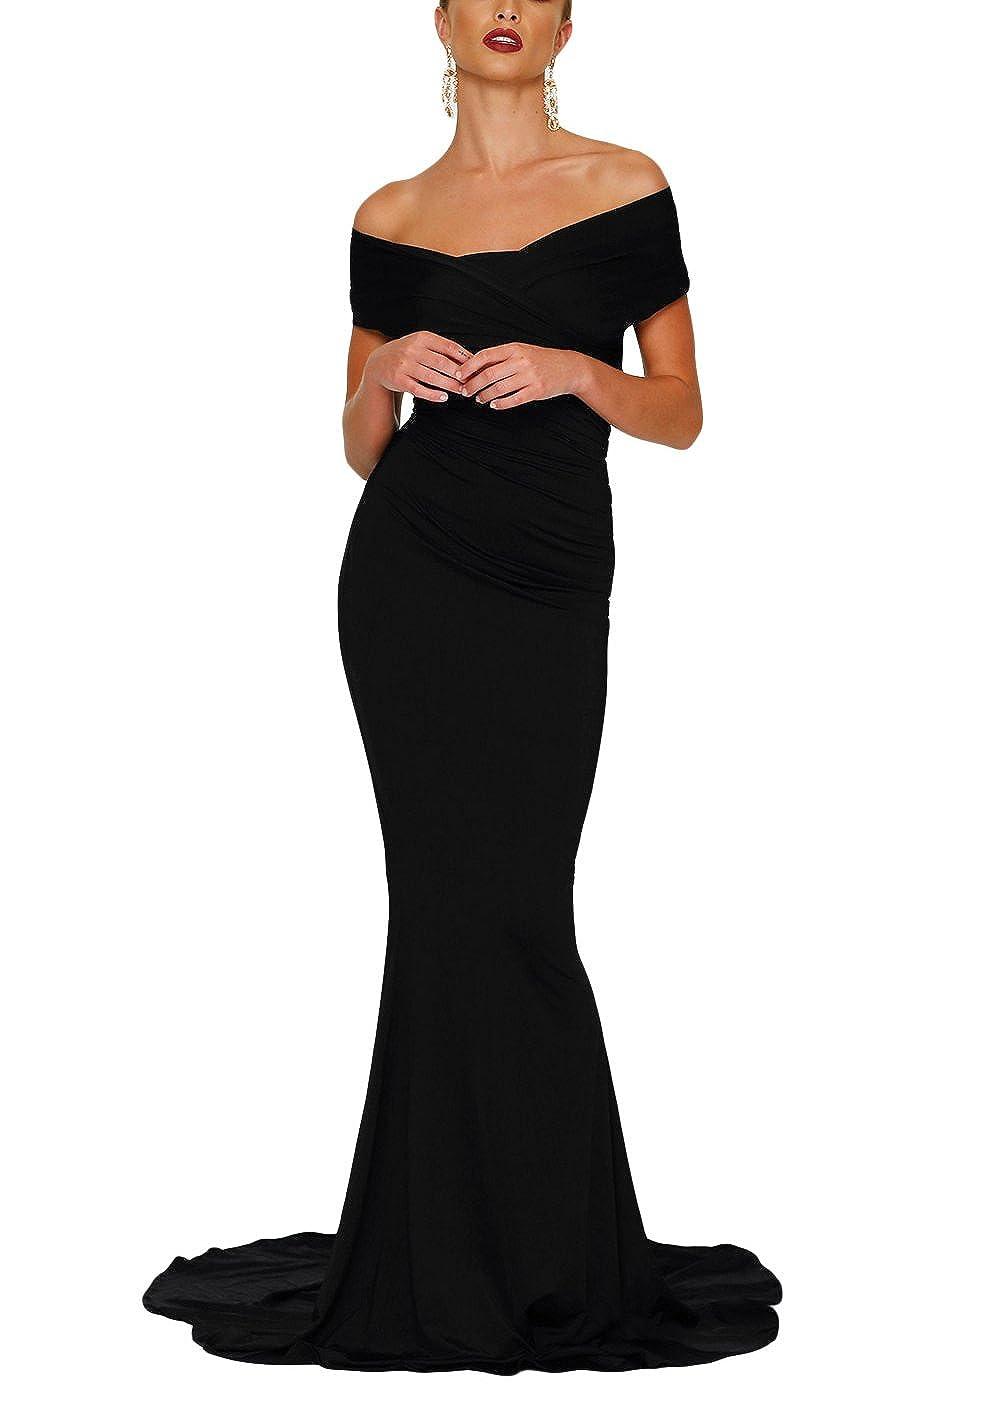 2ddb62fe6b4f Amazon.com: XAKALAKA Off Shoulder Ruched Long Formal Evening Mermaid  Wedding Gowns: Clothing